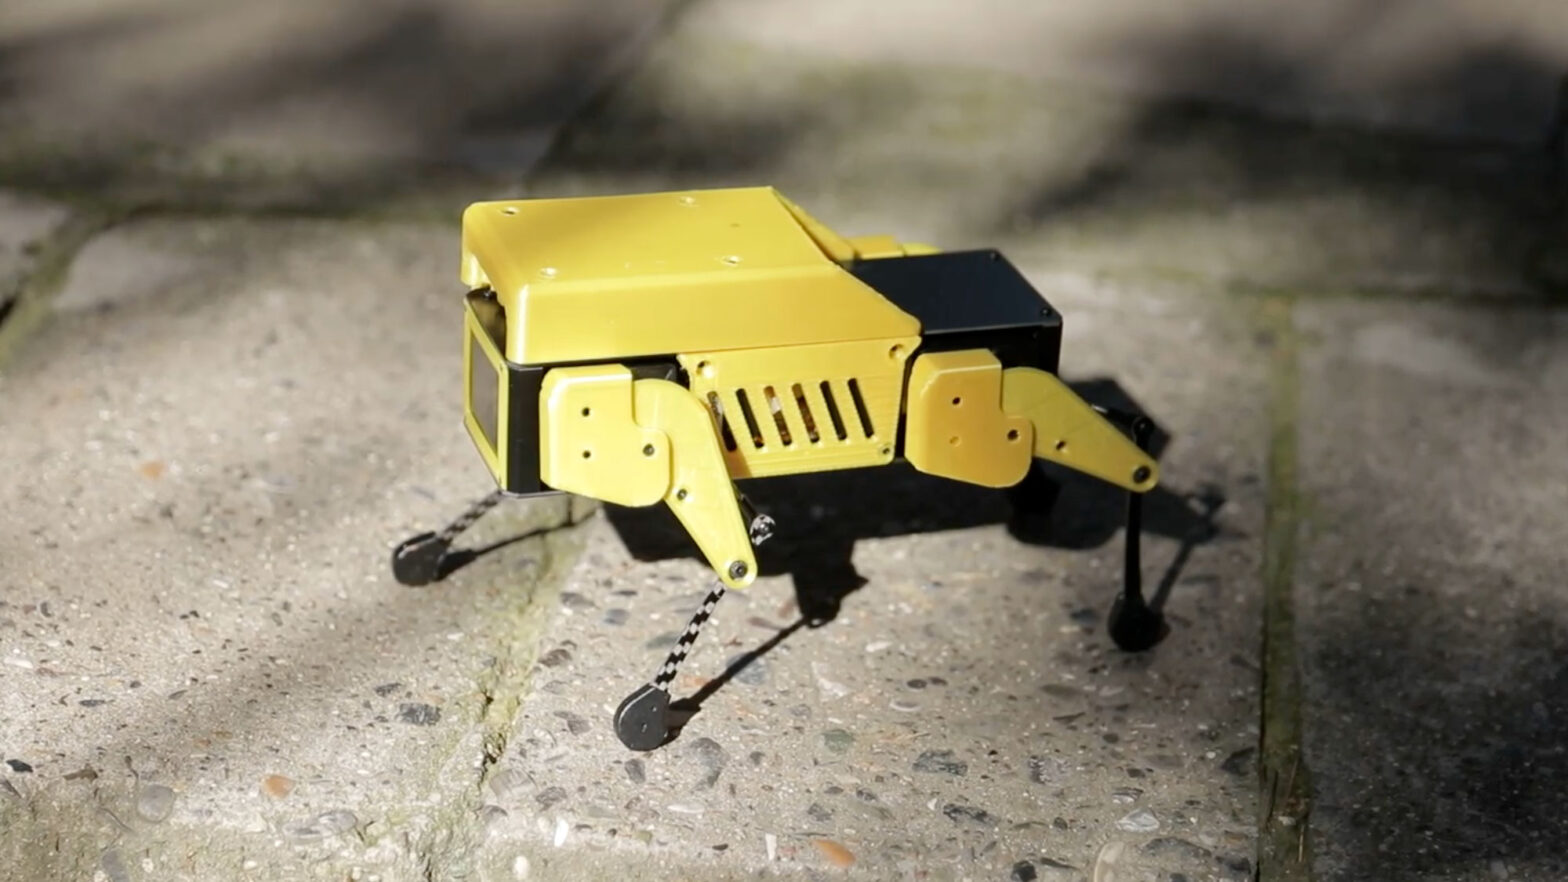 Mini Pupper Open-Source ROS Robot Dog